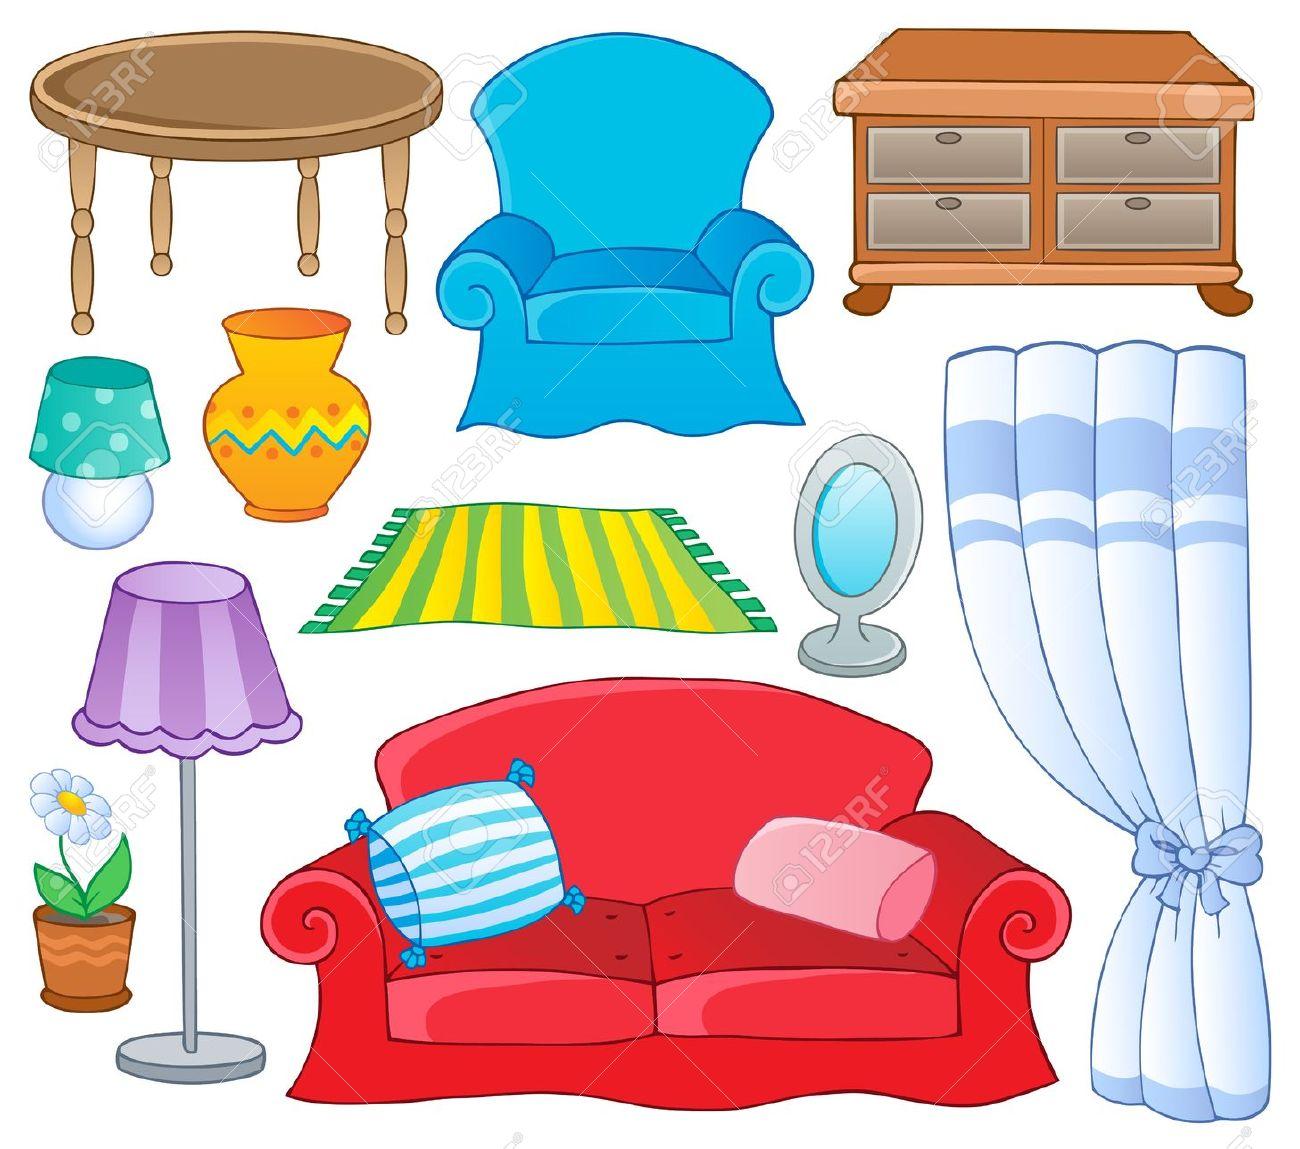 Furniture clipart home furniture Furnishings ideas clip Home furnishings